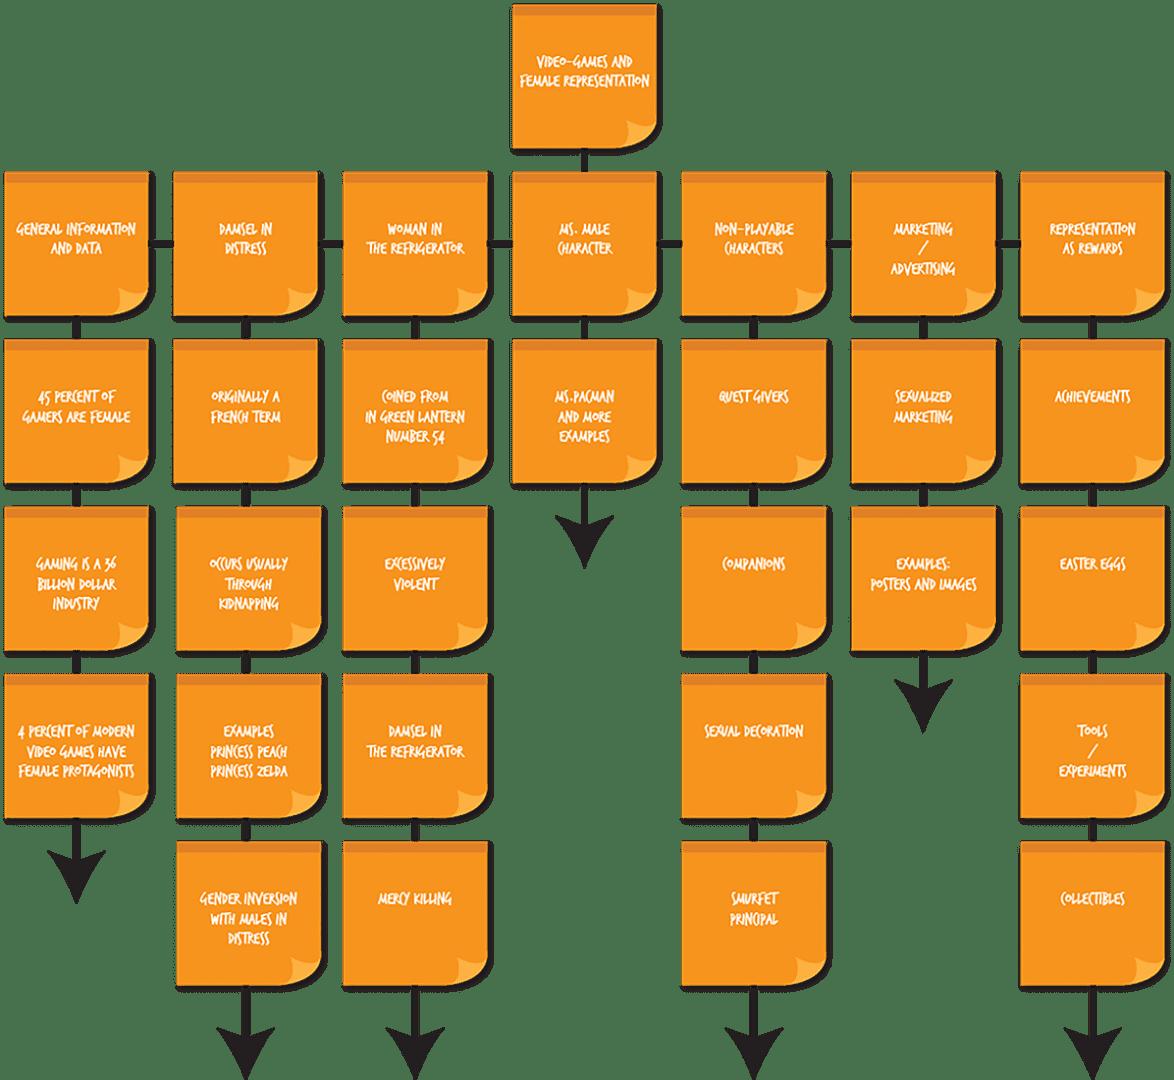 Digital prototype flow